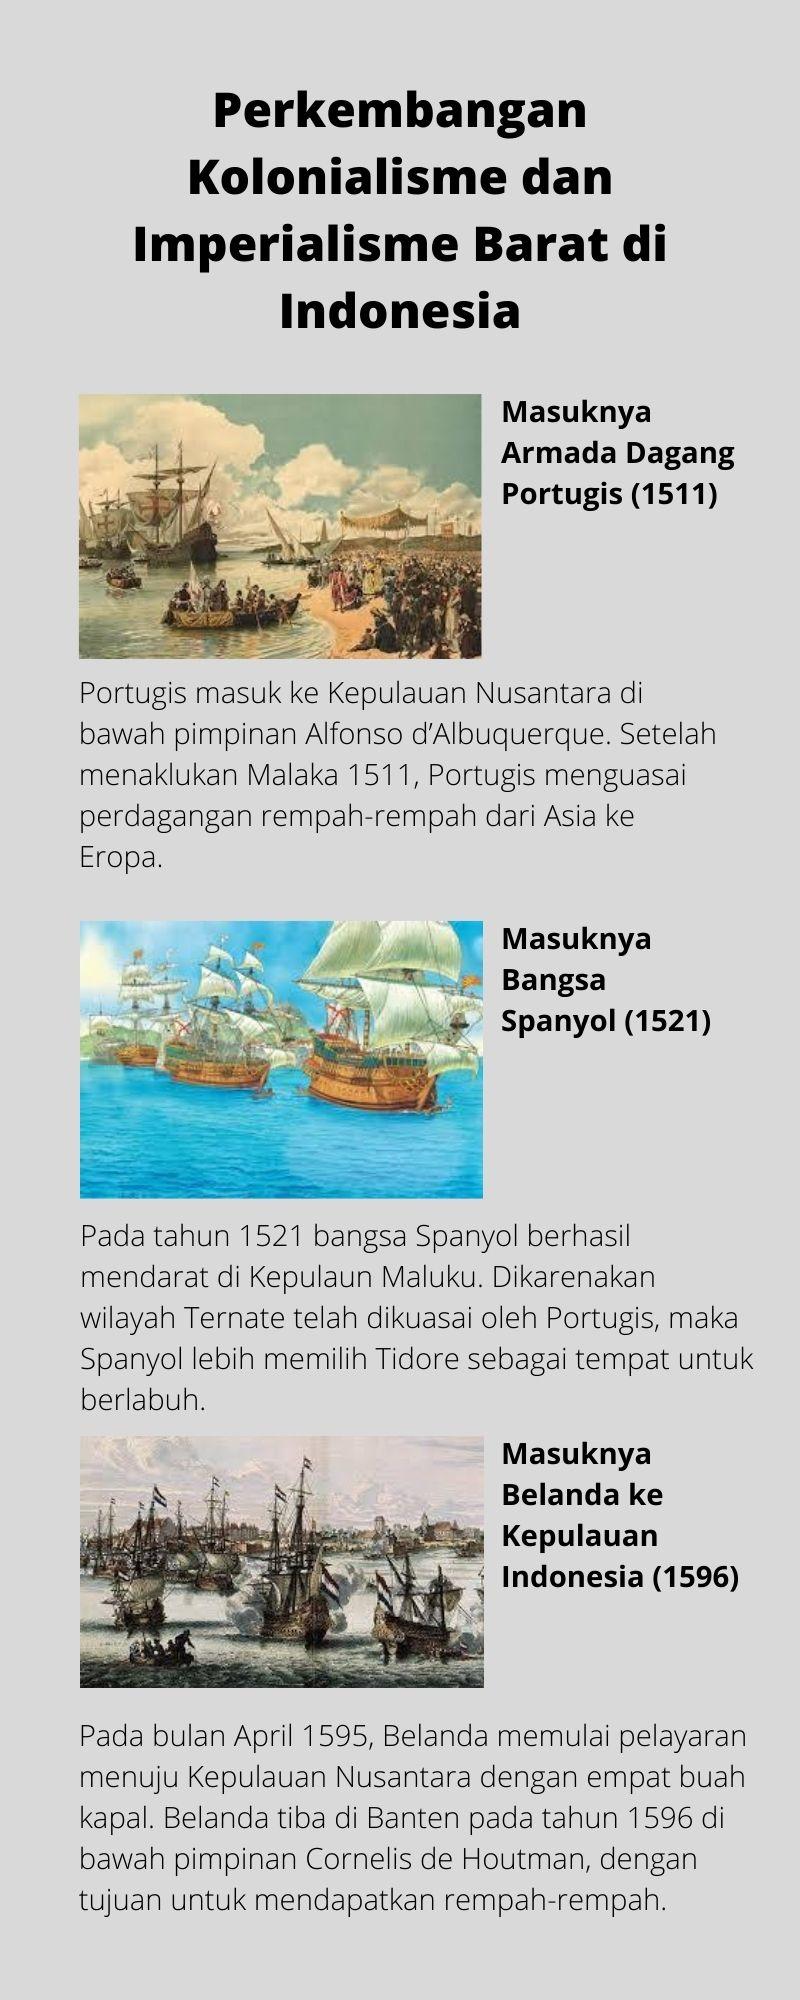 Arti Kolonialisme Dan Imperialisme : kolonialisme, imperialisme, Perkembangan, Kolonialisme, Imperialisme, Barat, Indonesia, ABHISEVA.ID